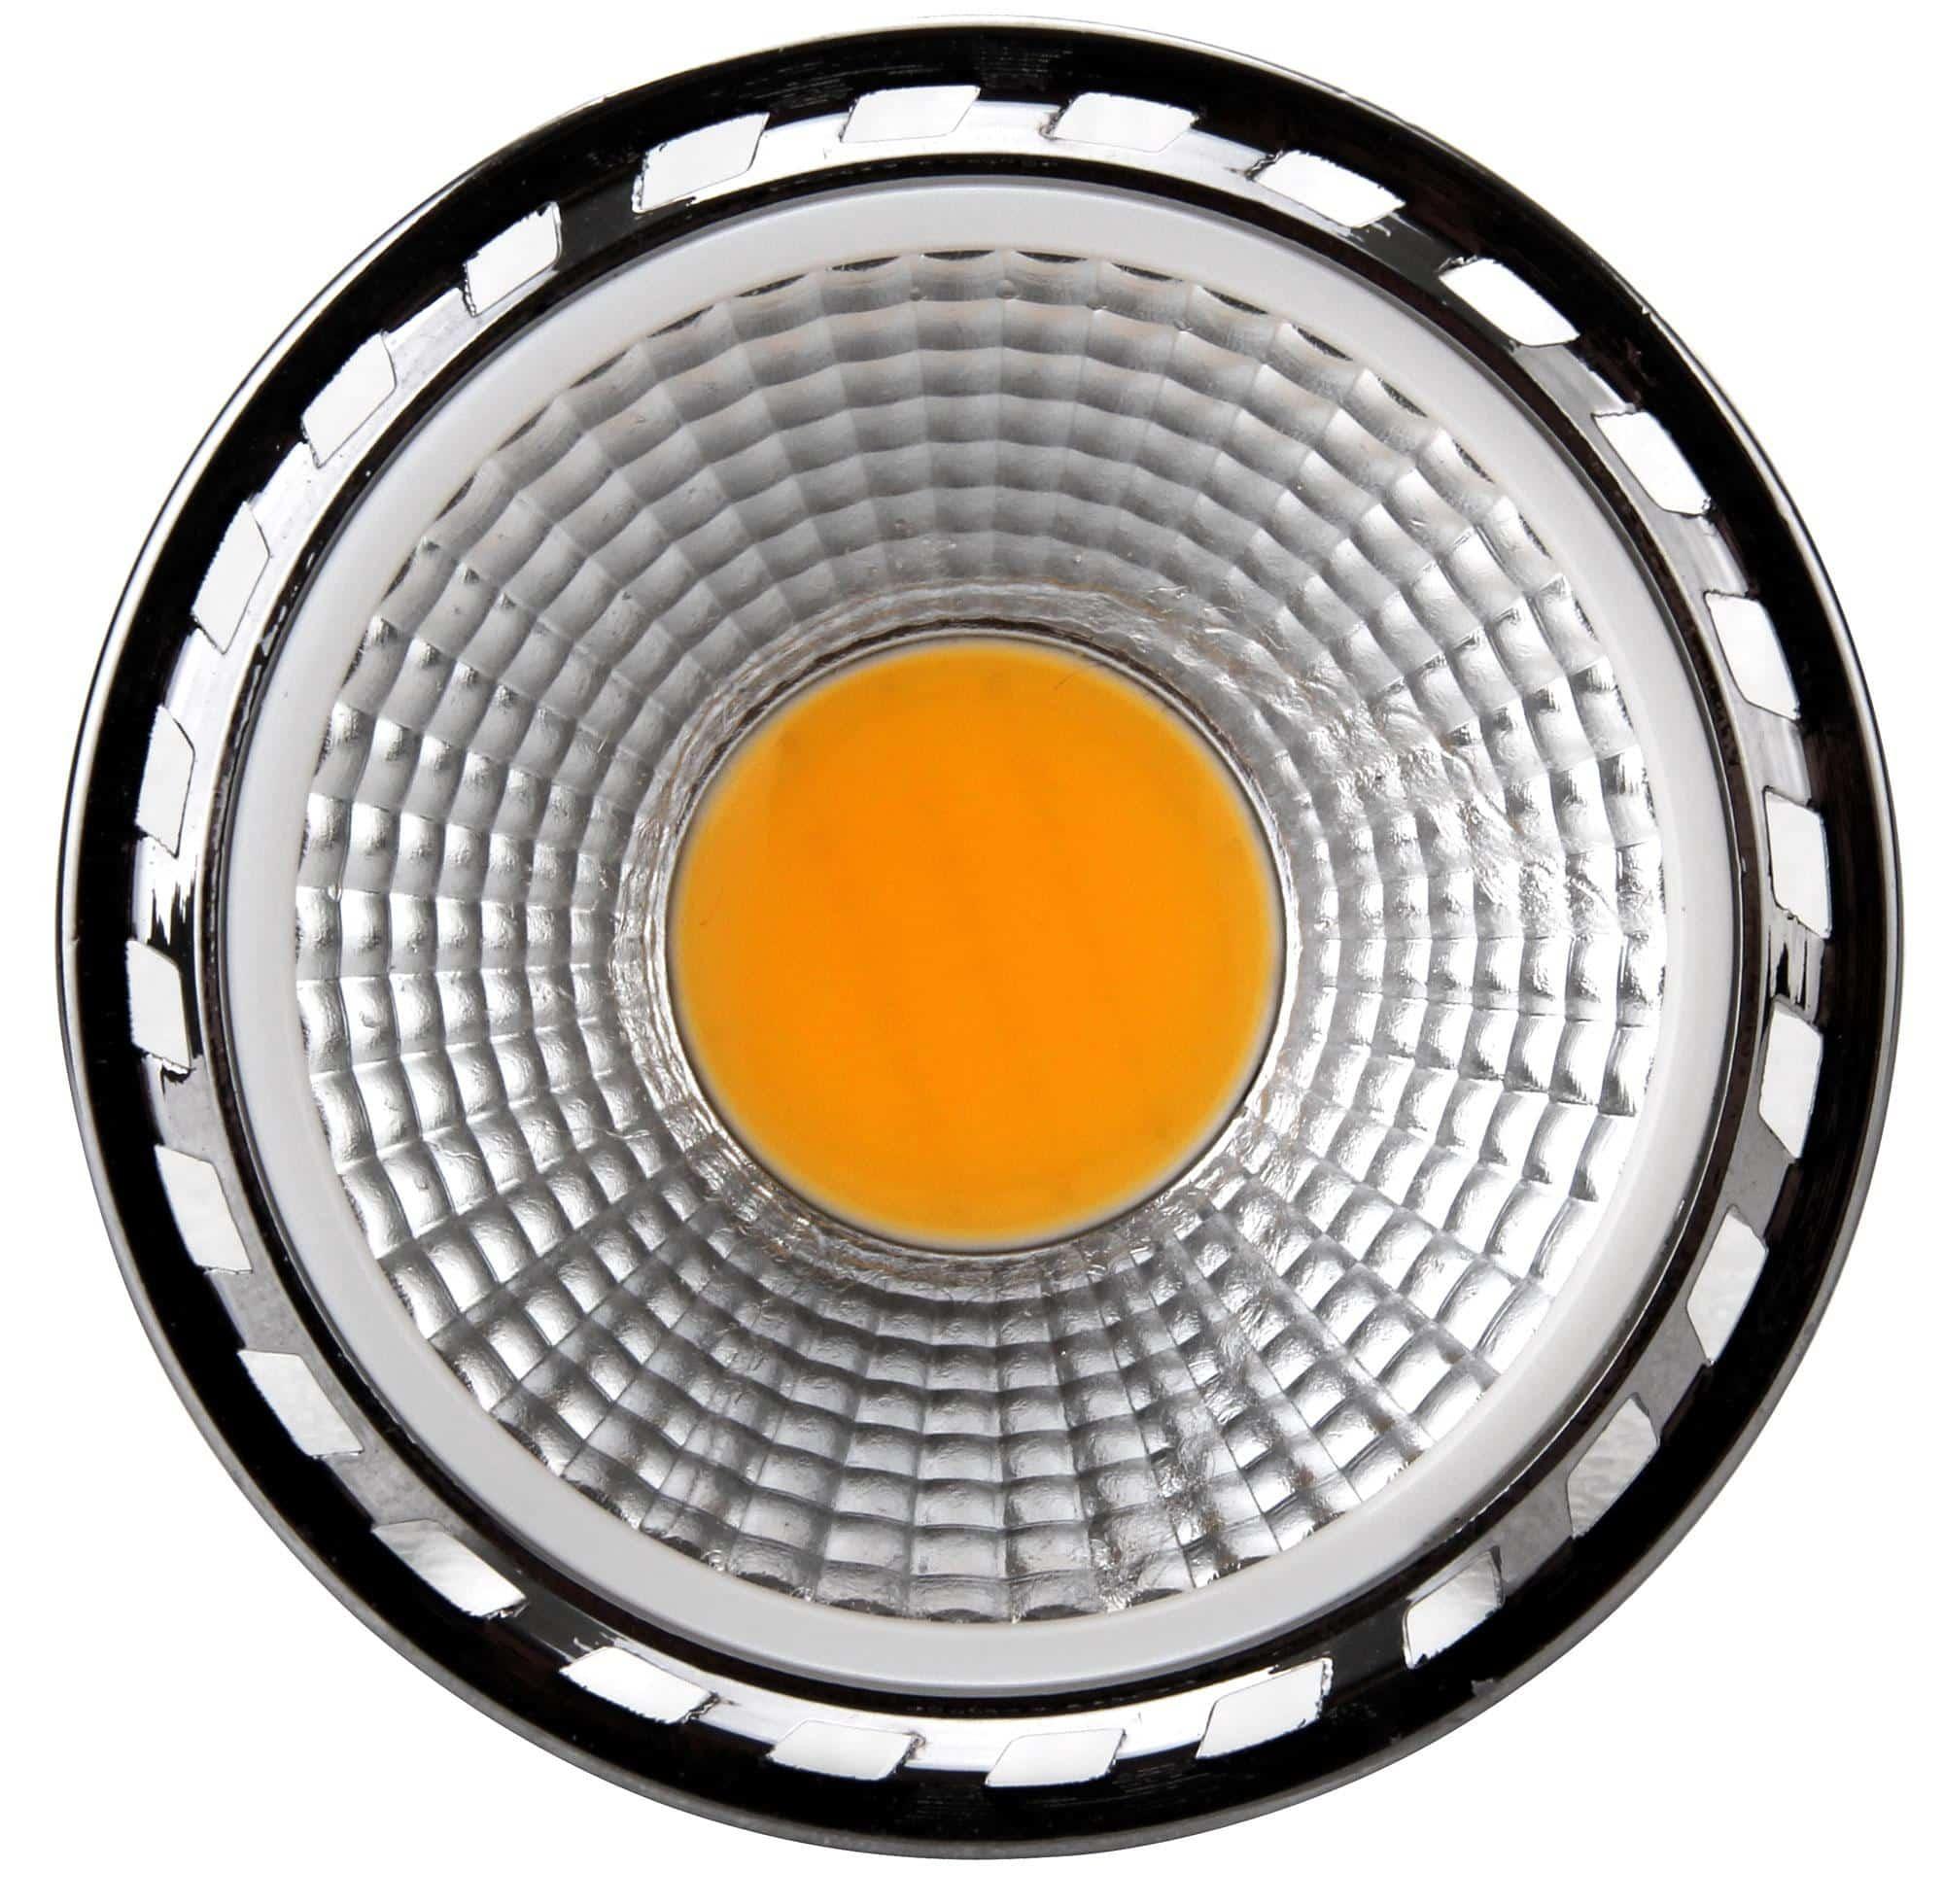 showlite led spot gu10w05k30n 5 watt 330 lumen sockel gu10 3000 kelvin. Black Bedroom Furniture Sets. Home Design Ideas